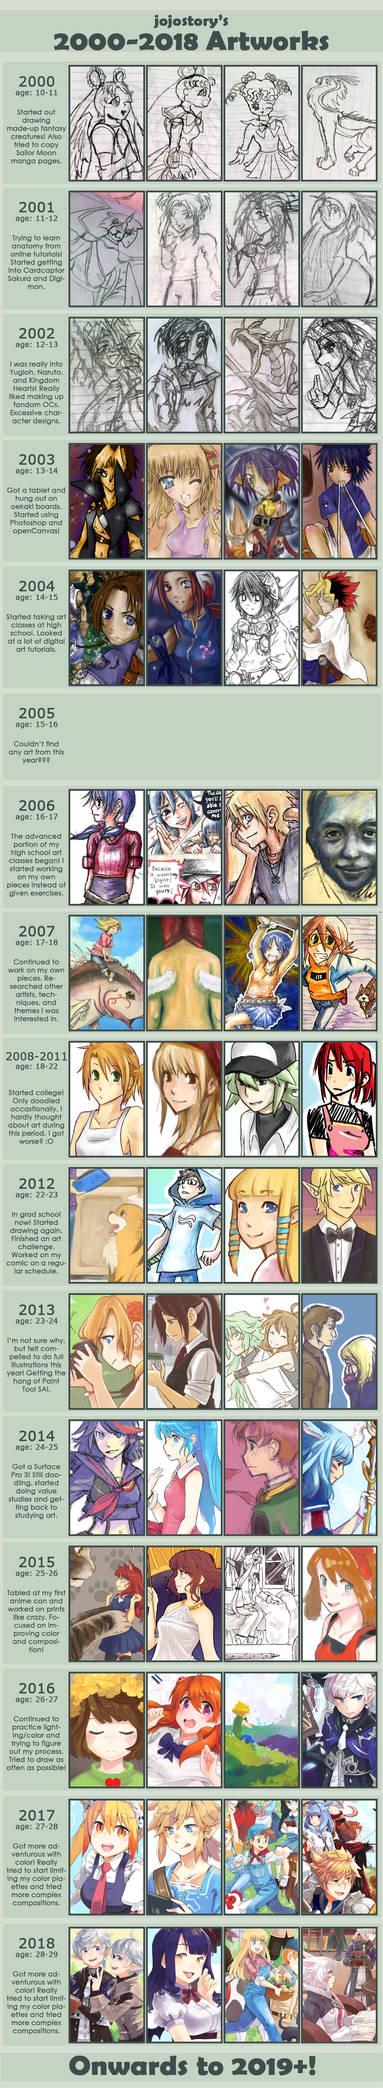 Art Improvement 2000 - 2018 by jojostory